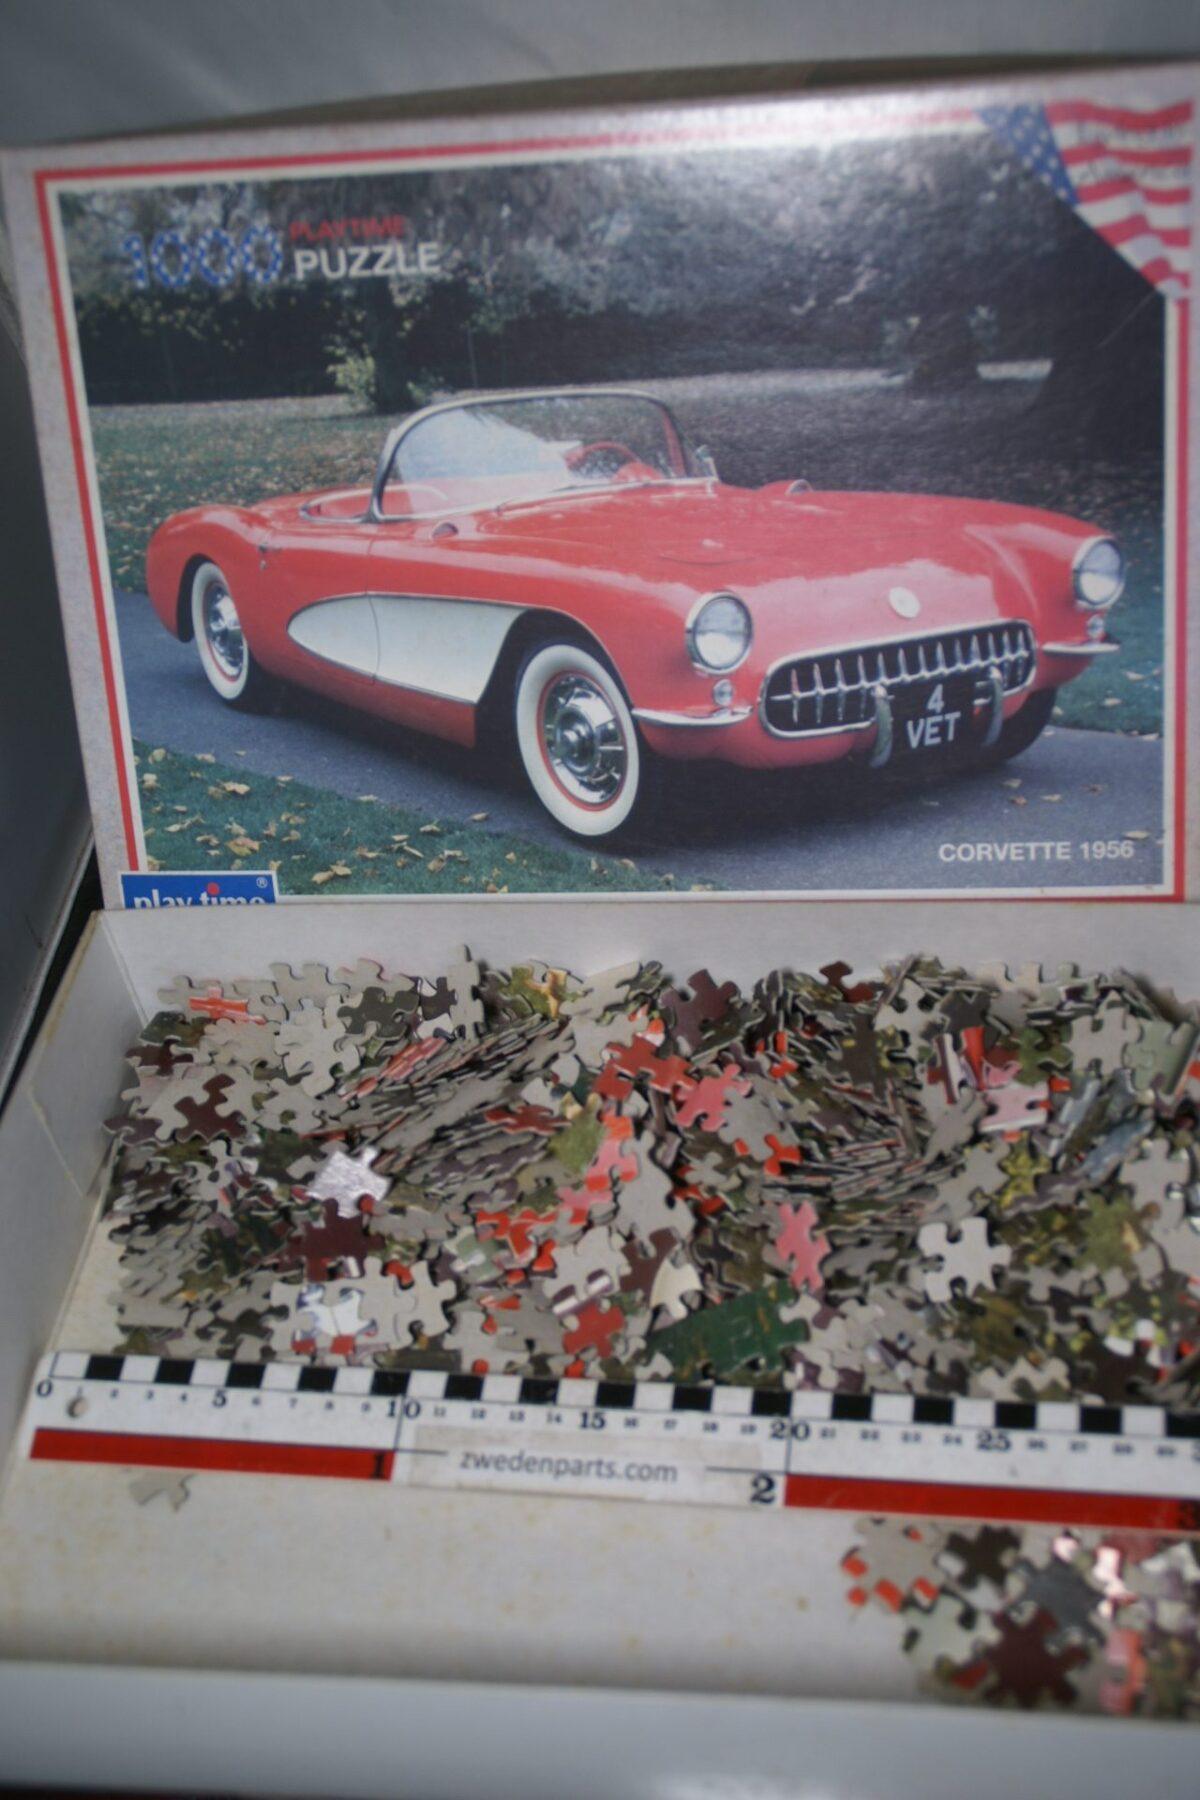 DSC05501 1956 Chevrolet Corvette puzzel 60er jaren